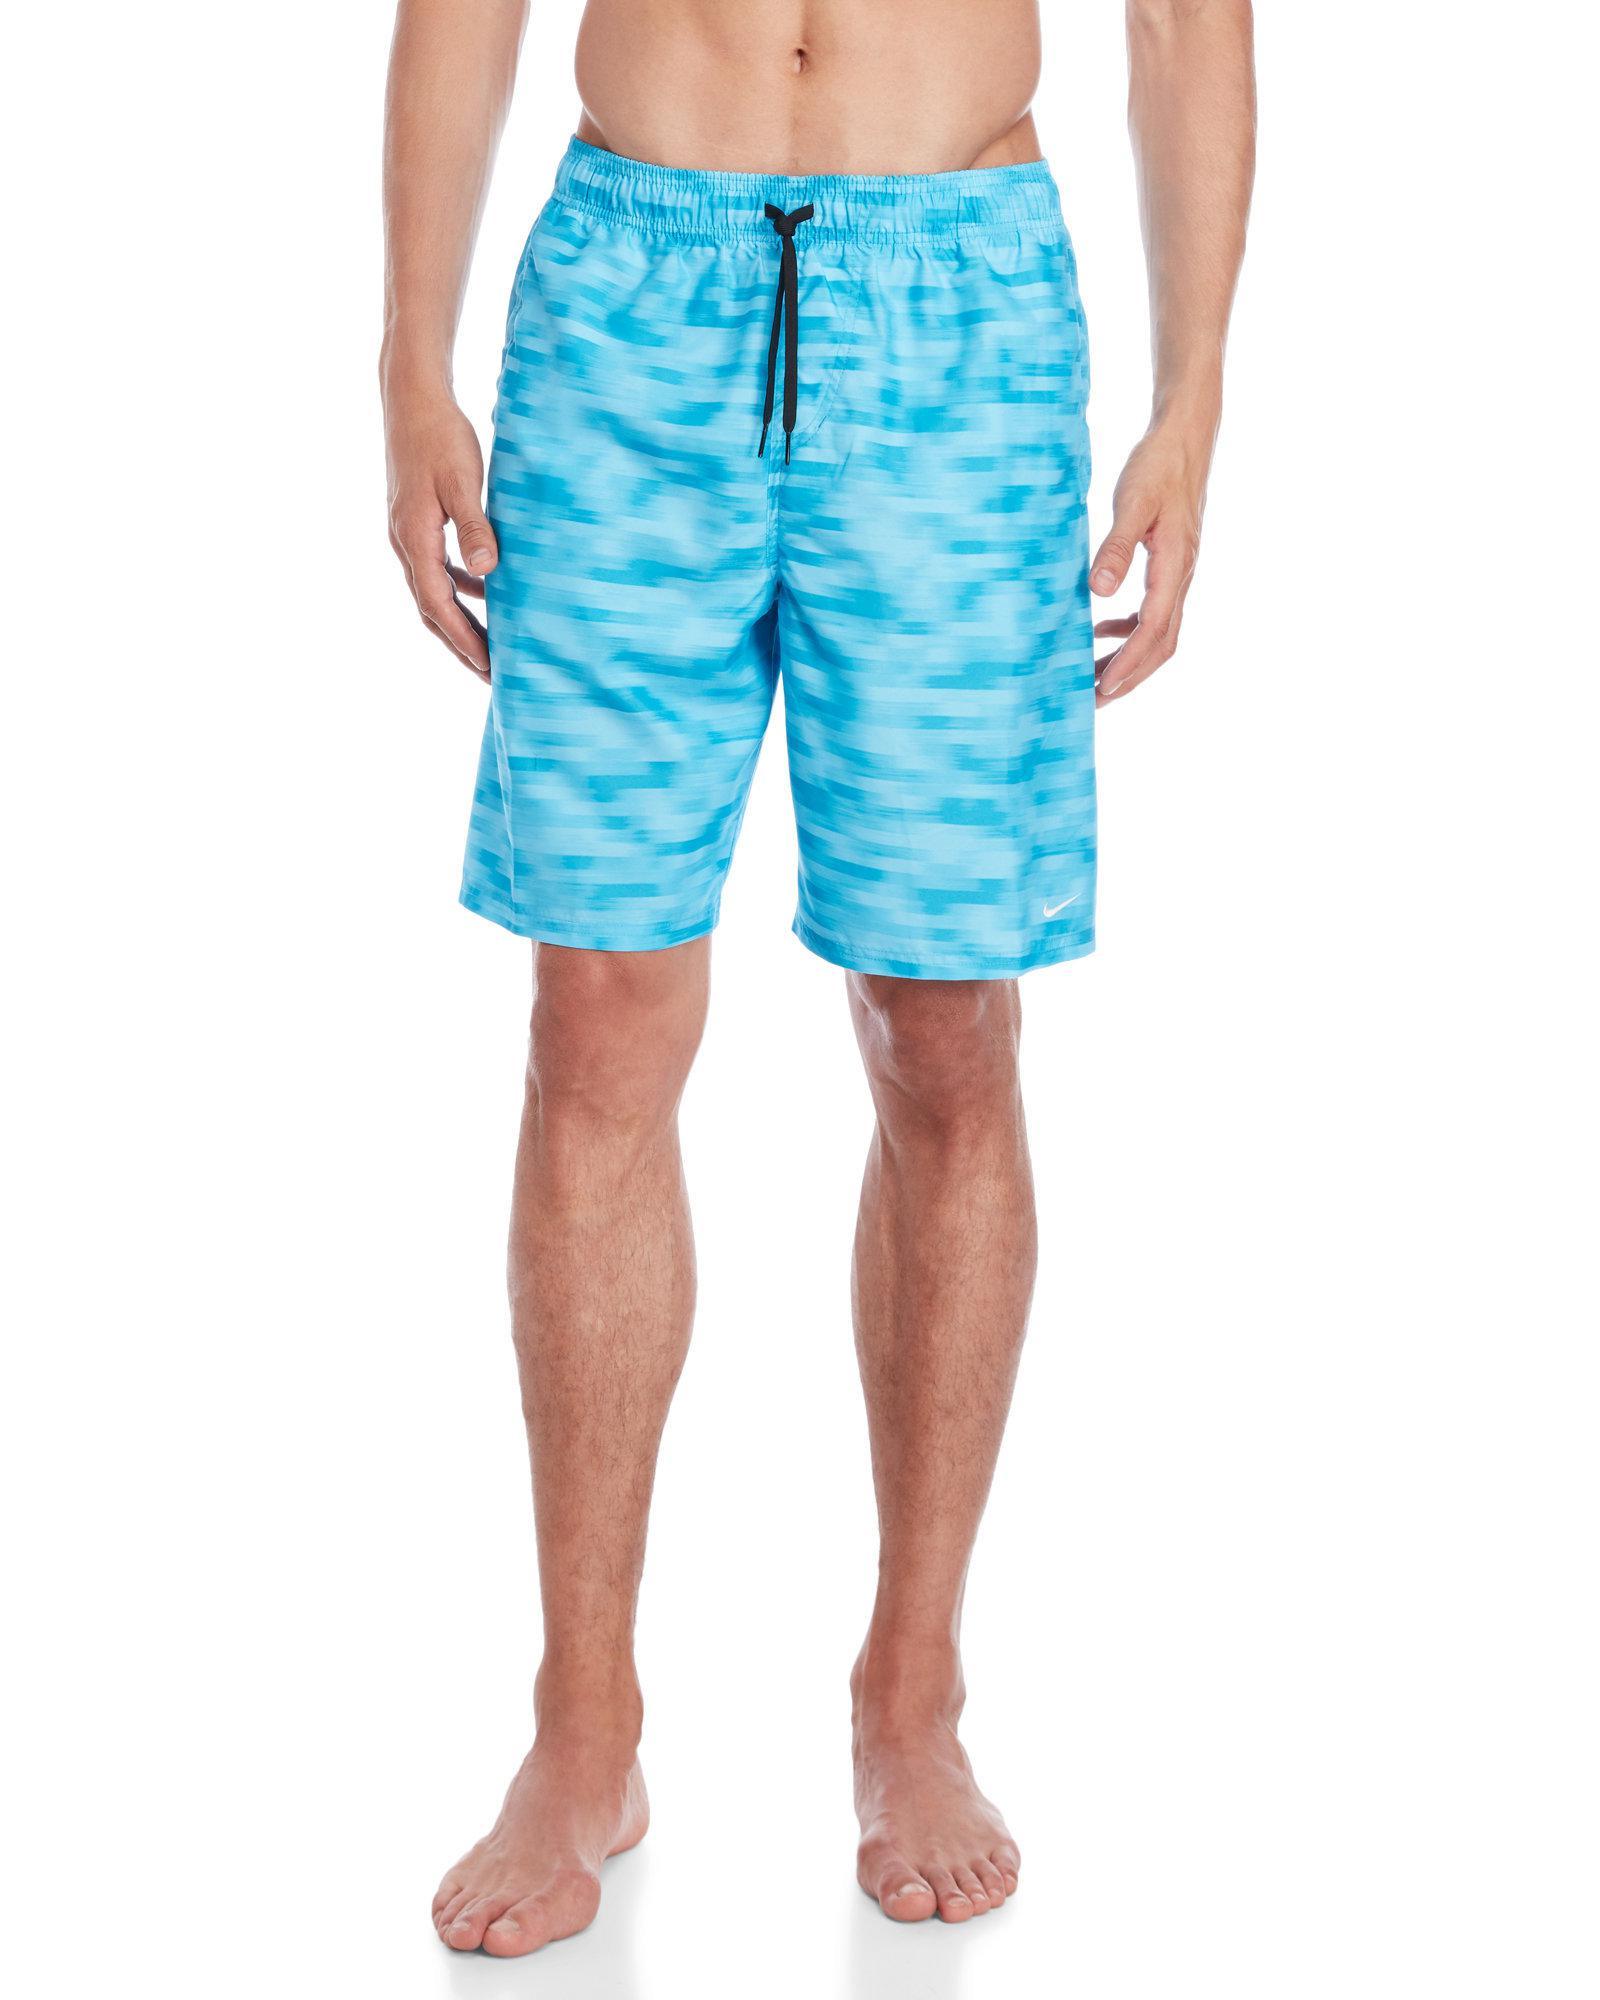 ede9ba407f Lyst - Nike Blurred Stripe Volley Swim Trunks in Blue for Men